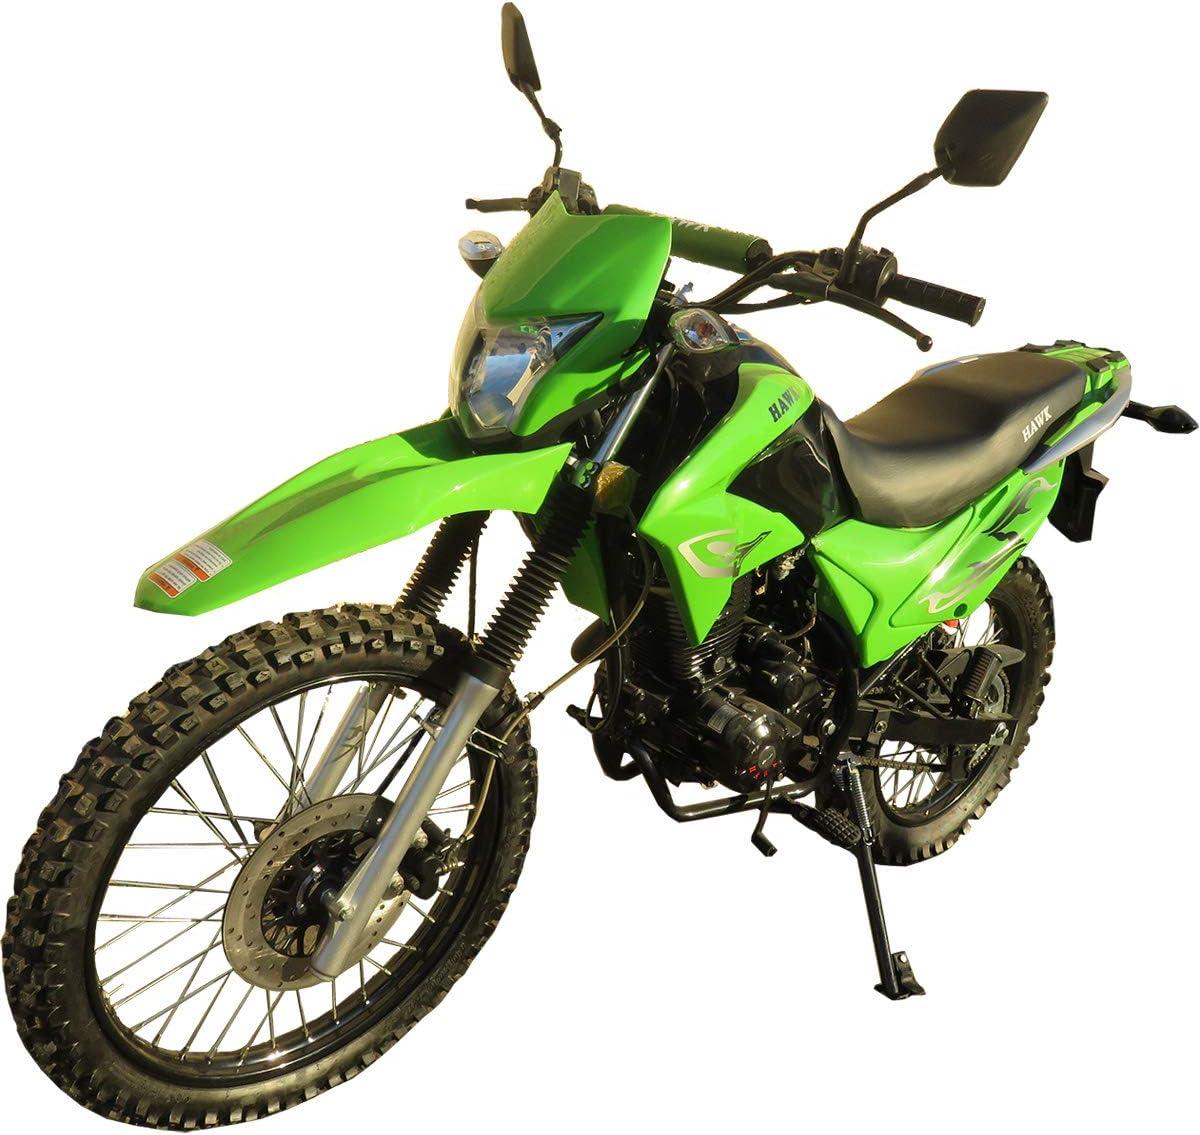 Black Rear Foot Hydraulic Brake Motocross Atv Accessories Rear Brake Pump Flat Pump Oil Pump Foot Brake Pump Motorcycle Modified Parts Available In Three Colors